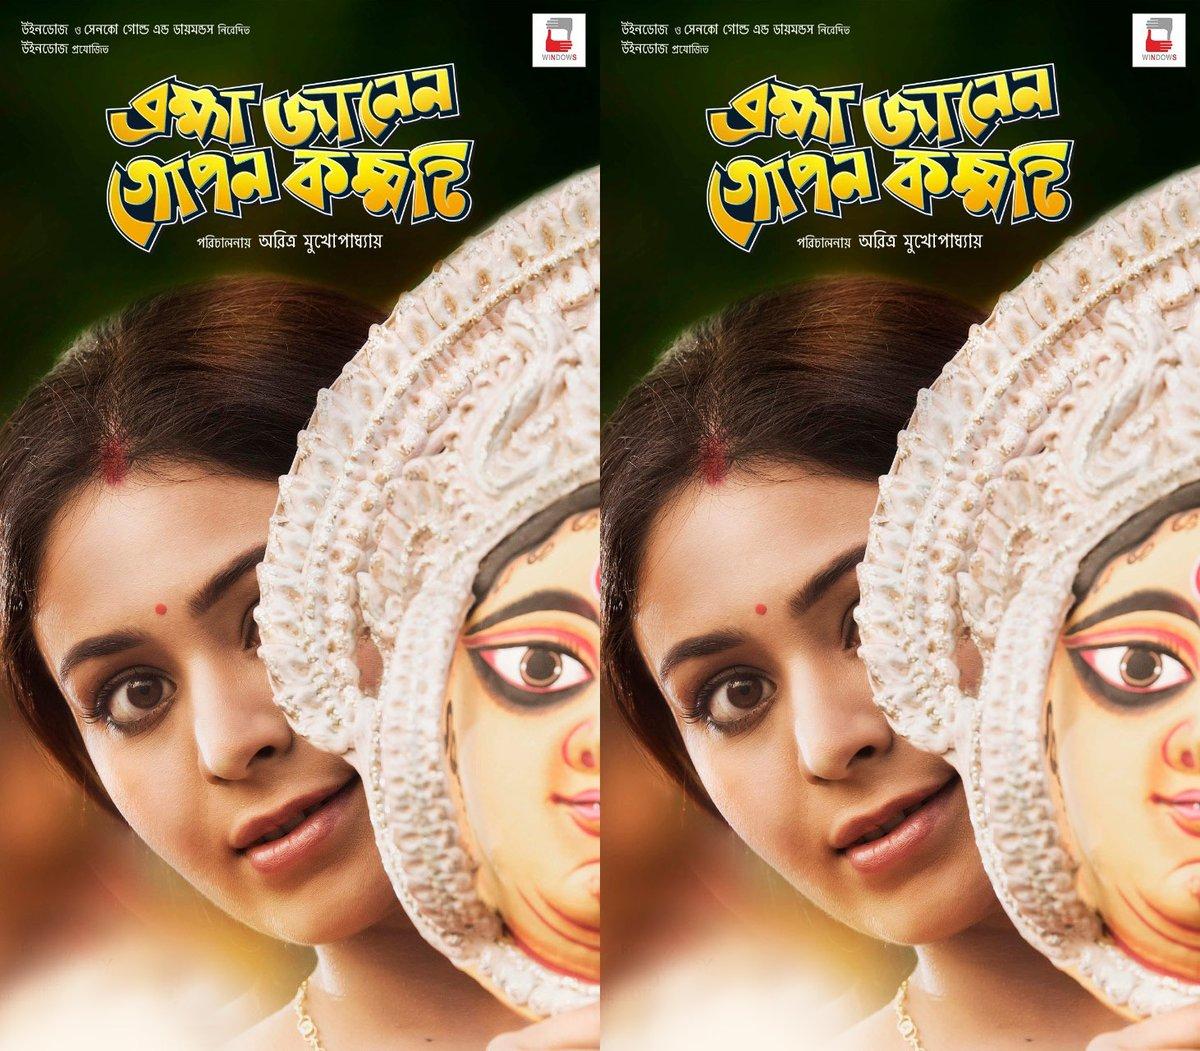 Replying to @INOXMovies: Bengali film #BrahmaJanenGoponKommoti 🔥🔥🔥 Coming #thisPuja at an #INOX near you!!